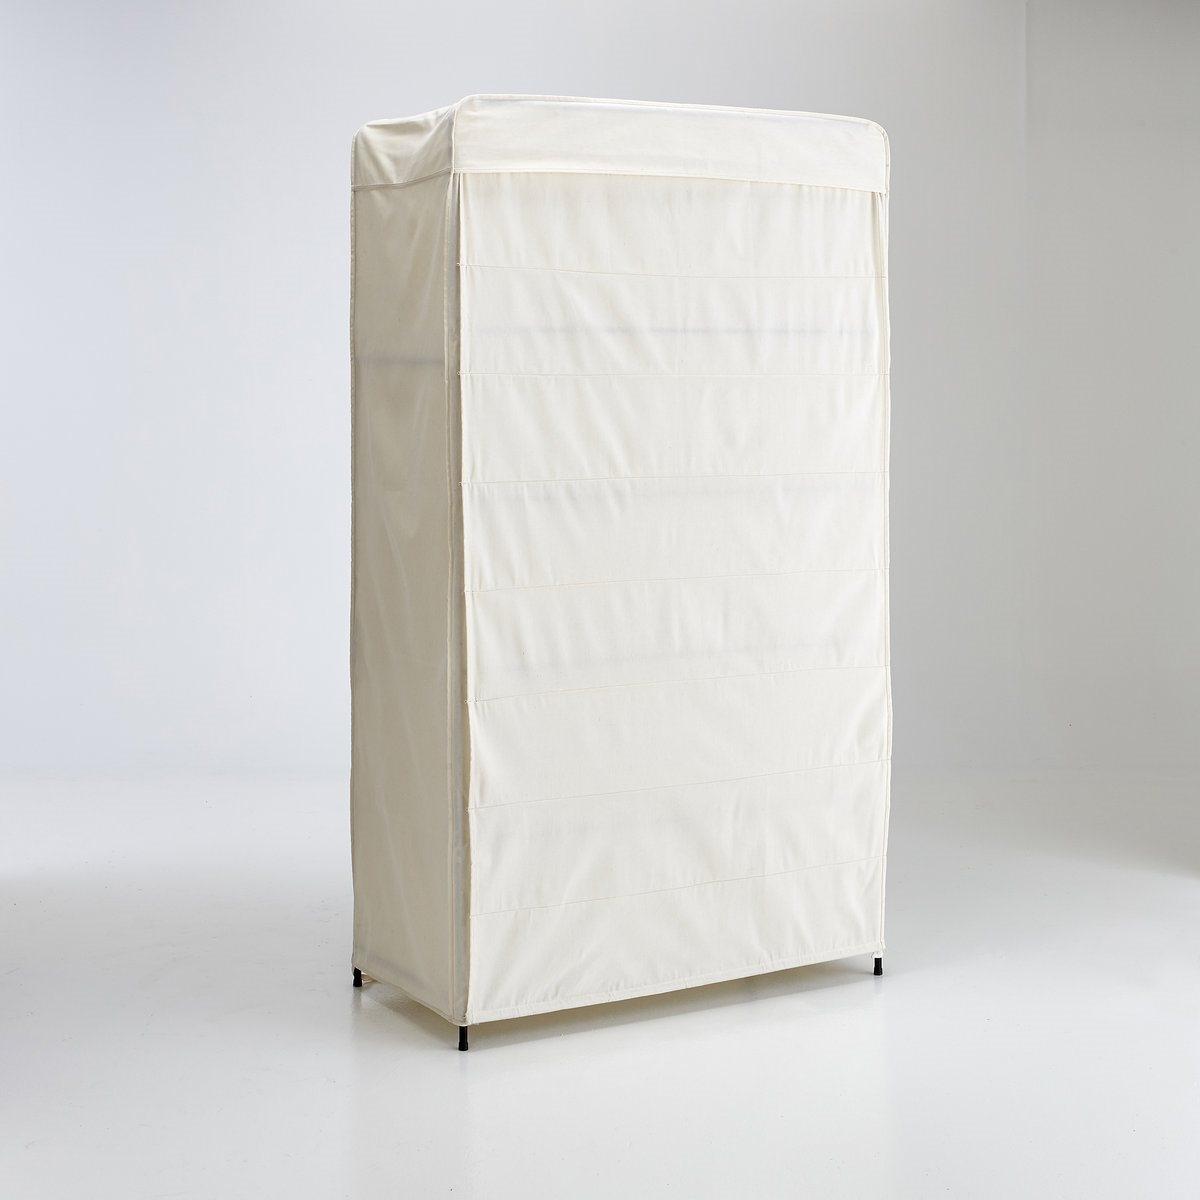 Шкаф для гардероба, Valice от La Redoute